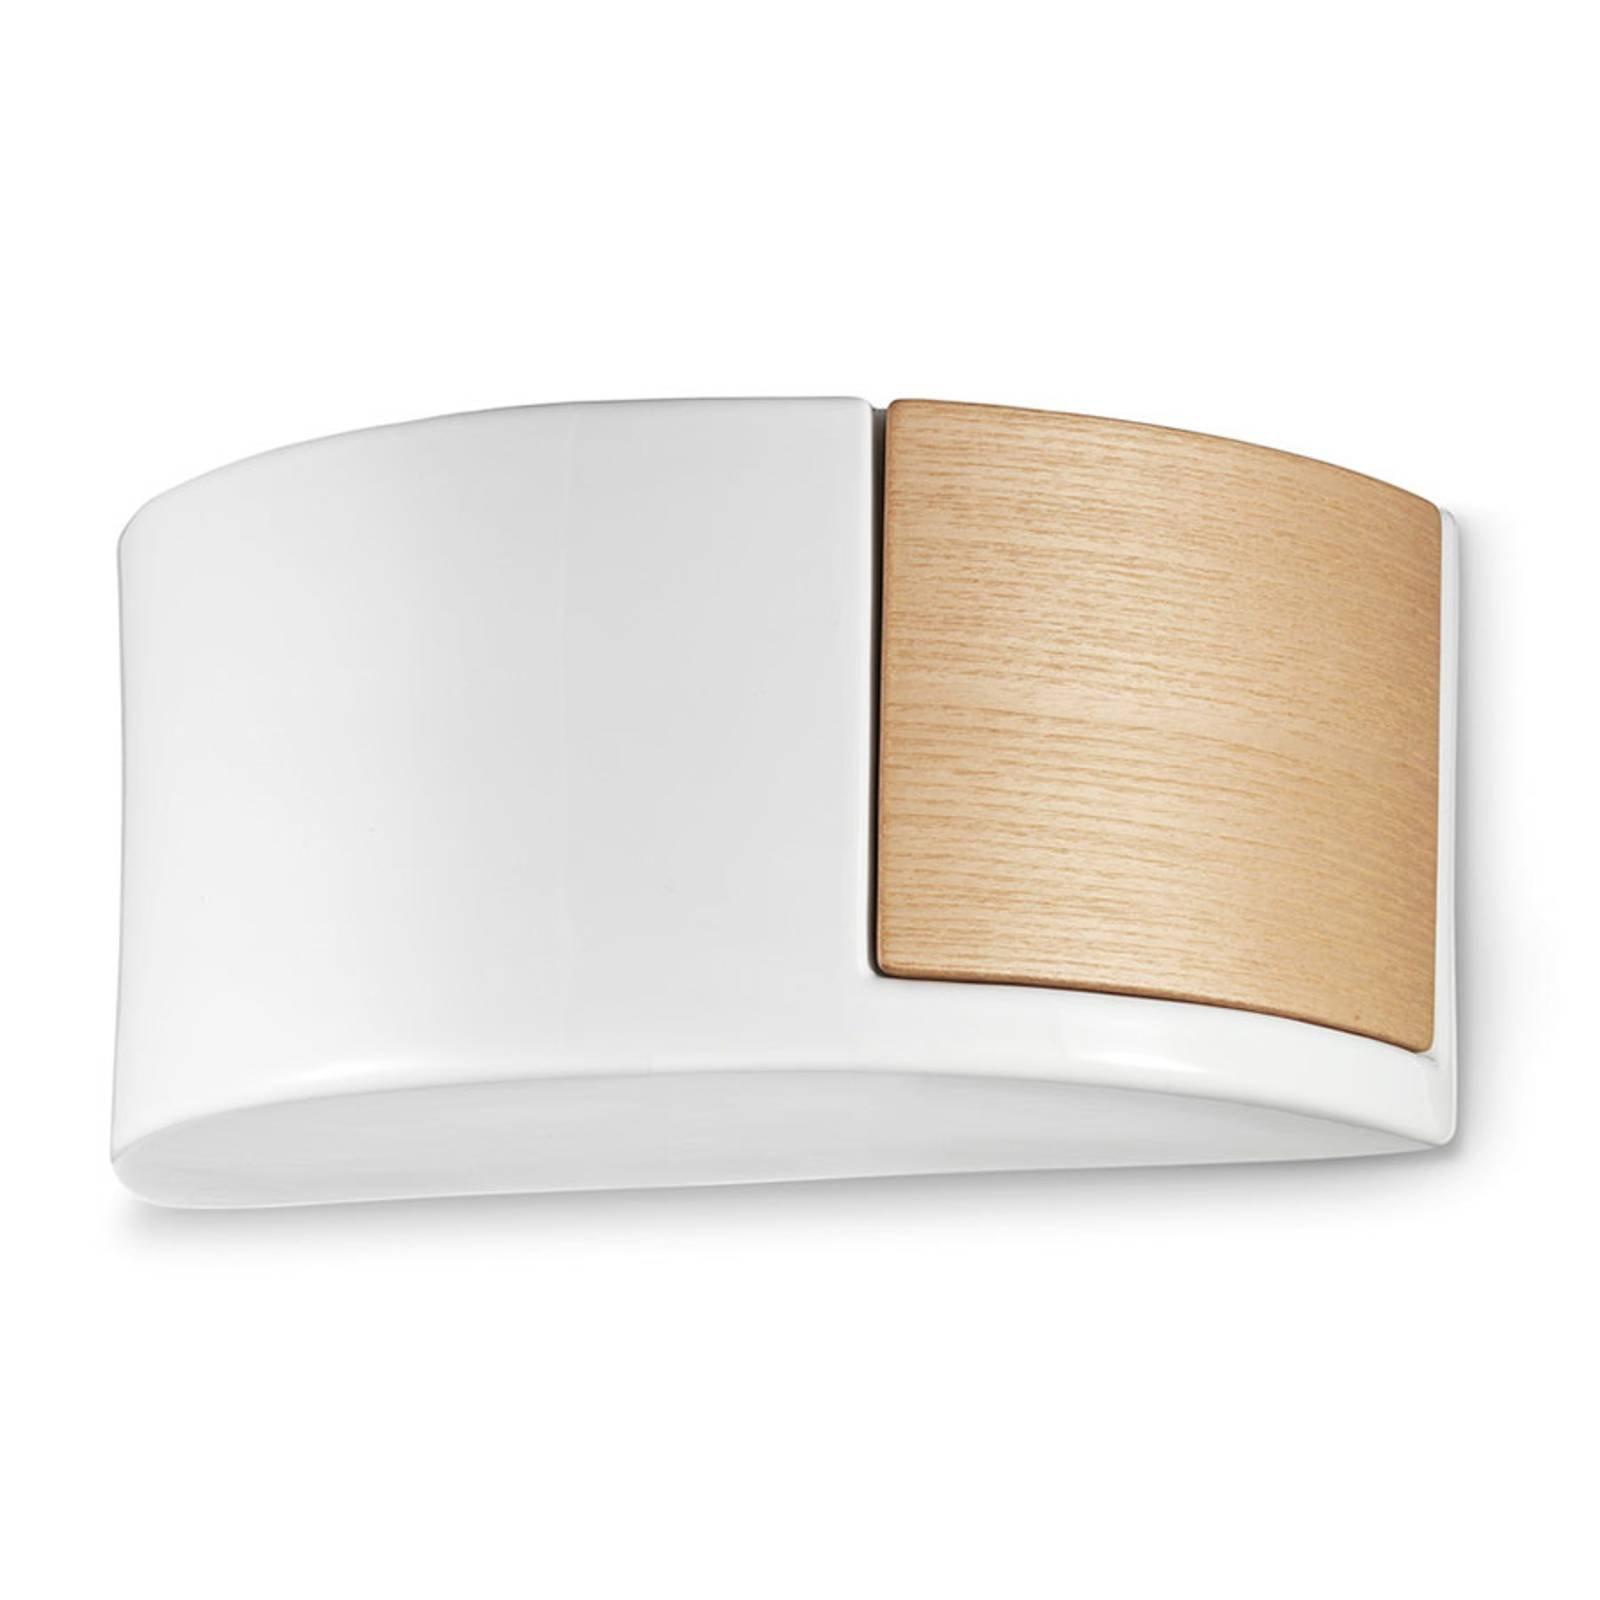 Nordisk vegglampe i keramikk C1795/27 hvit